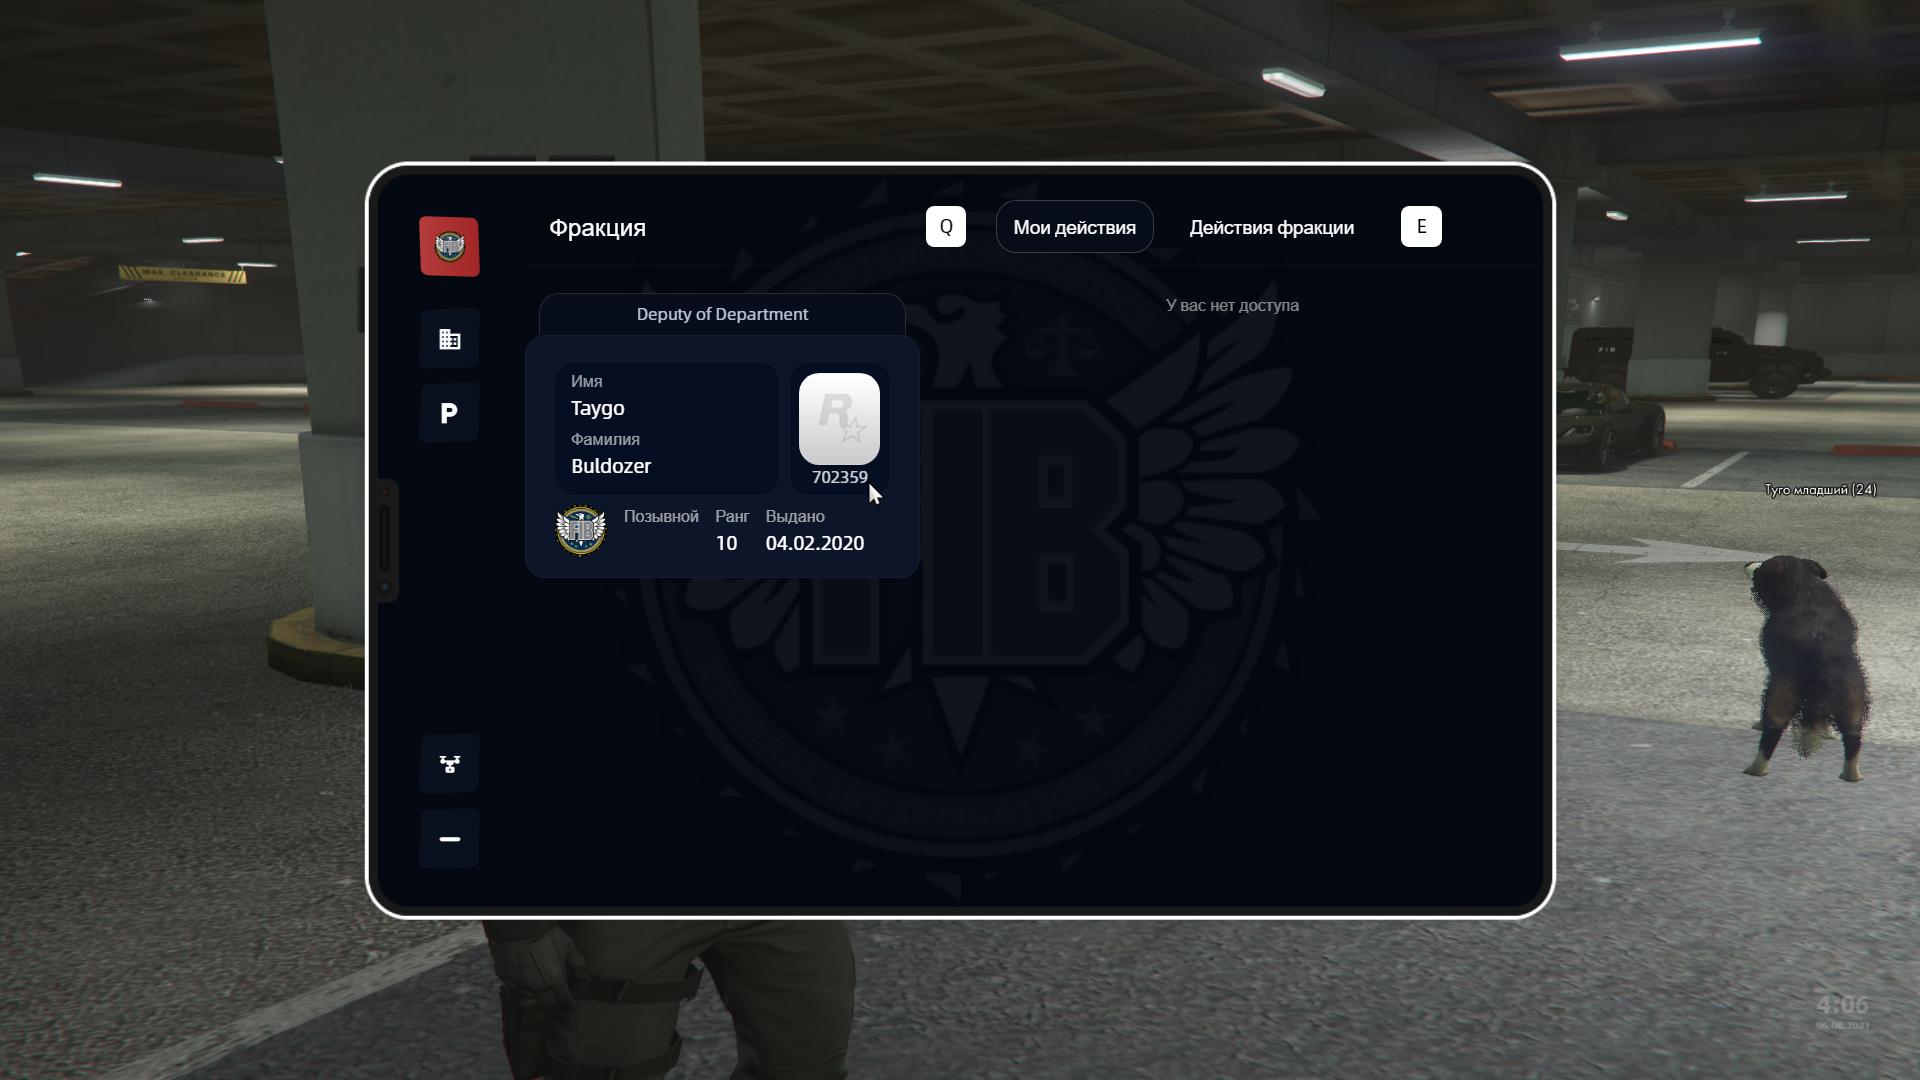 Grand_Theft_Auto_V_Screenshot_2021.08.05_-_04.06.15.28.png